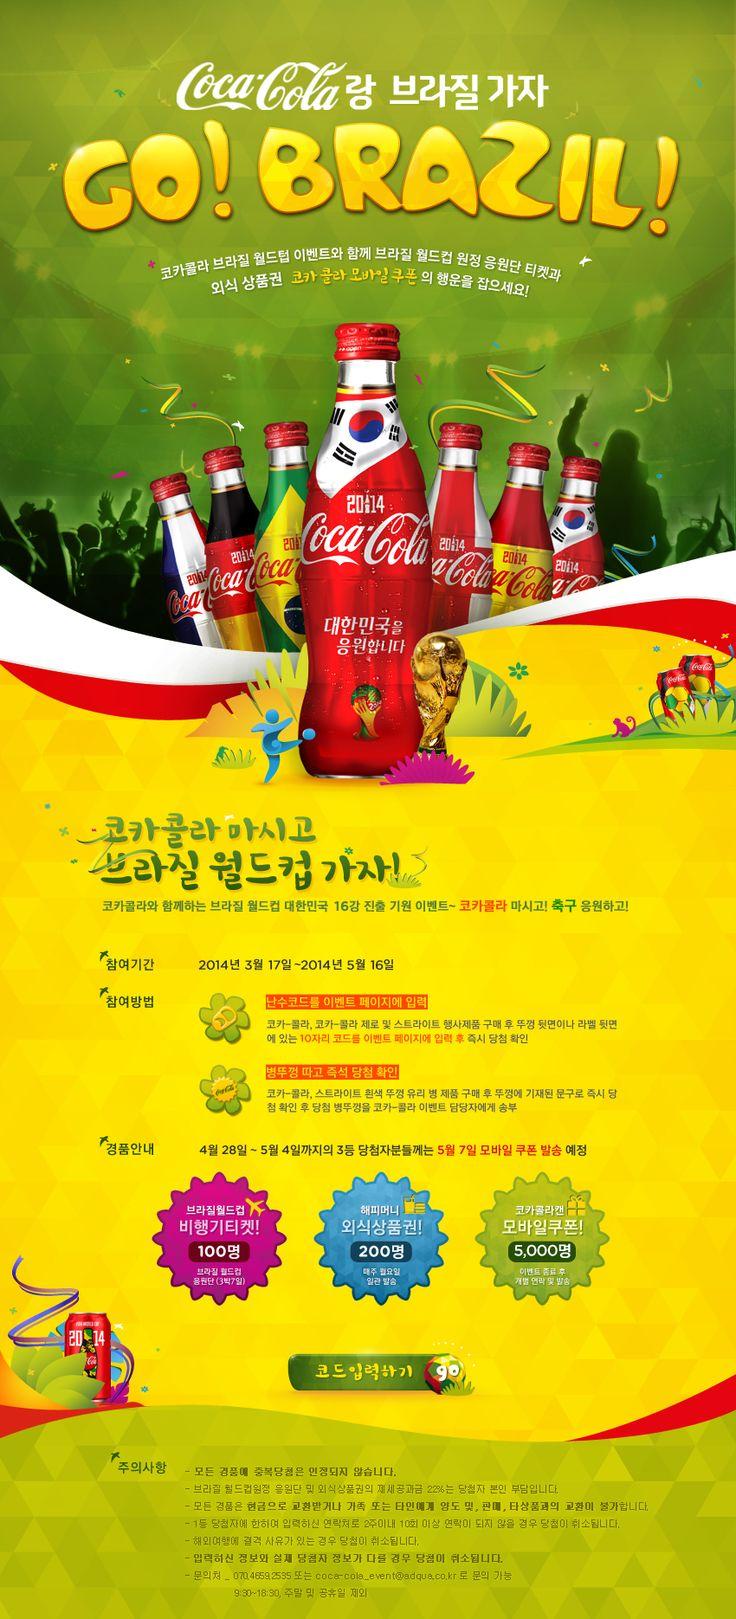 #2014 #FIFA #WorldCup #Brazil & #cocacola #eventpage #design #Haenggu #promotion